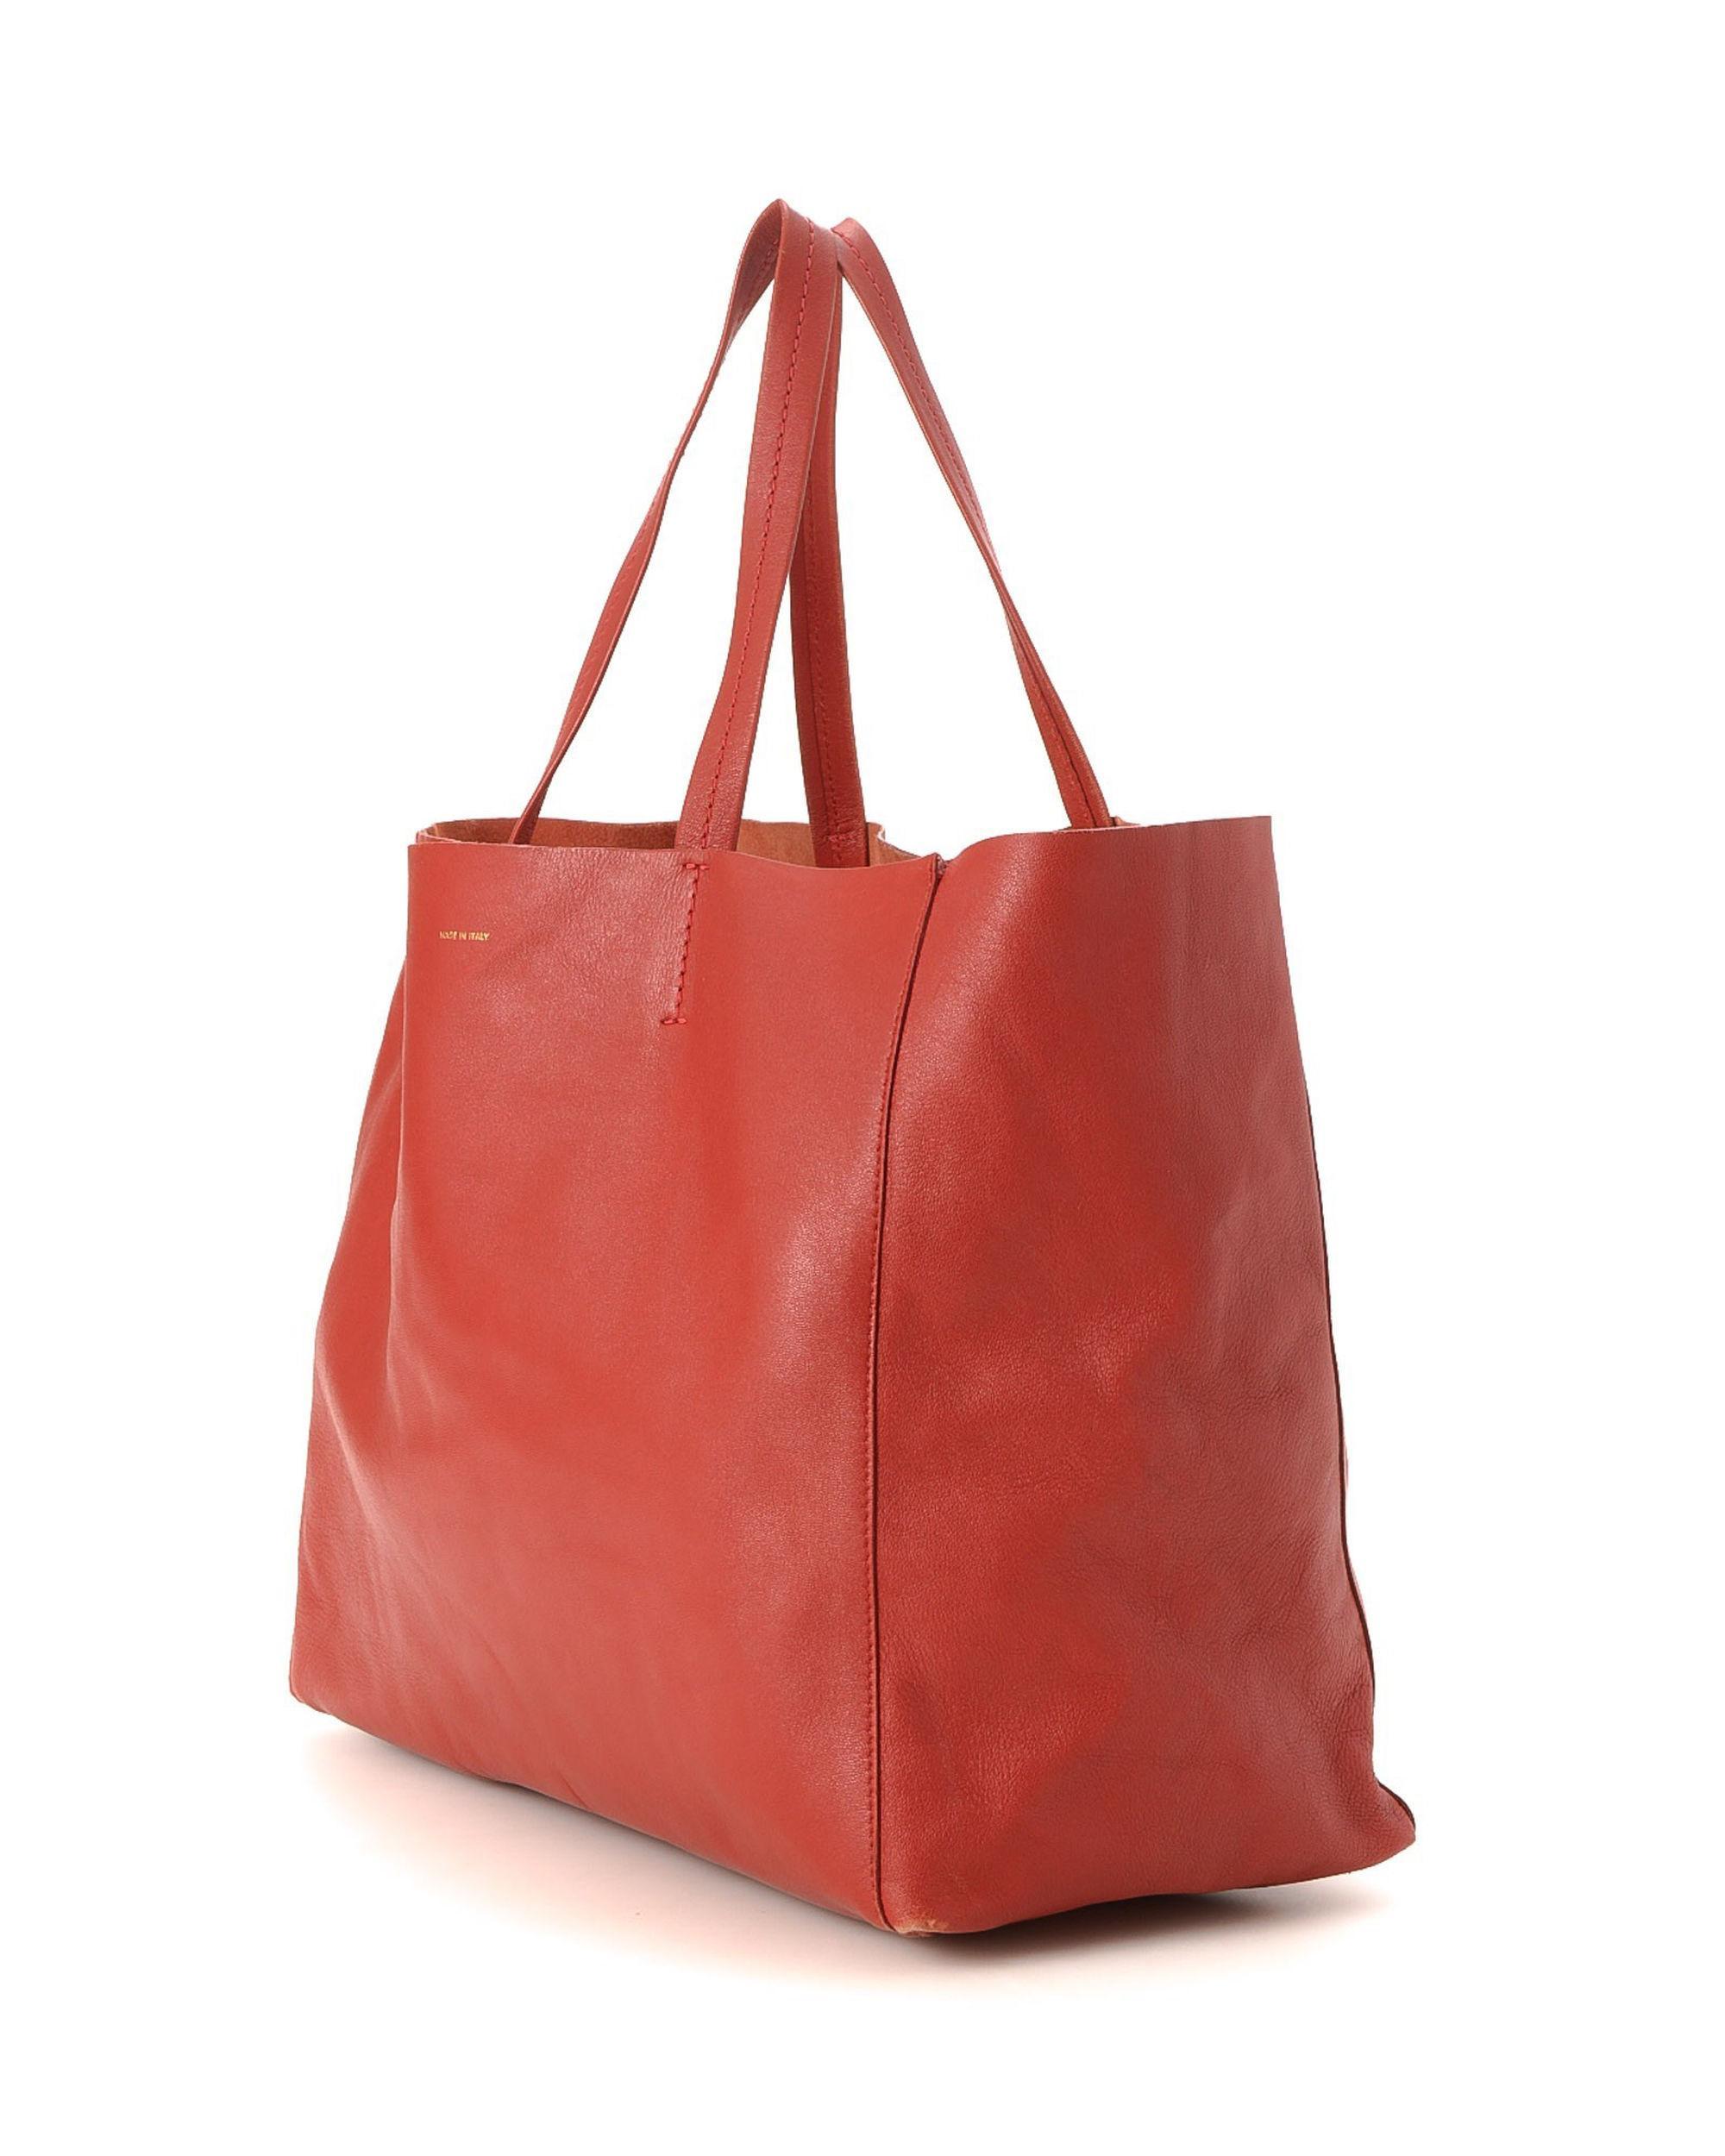 fd324c815a6c1 Lyst - Céline Cabas Horizontal Tote Bag - Vintage in Red